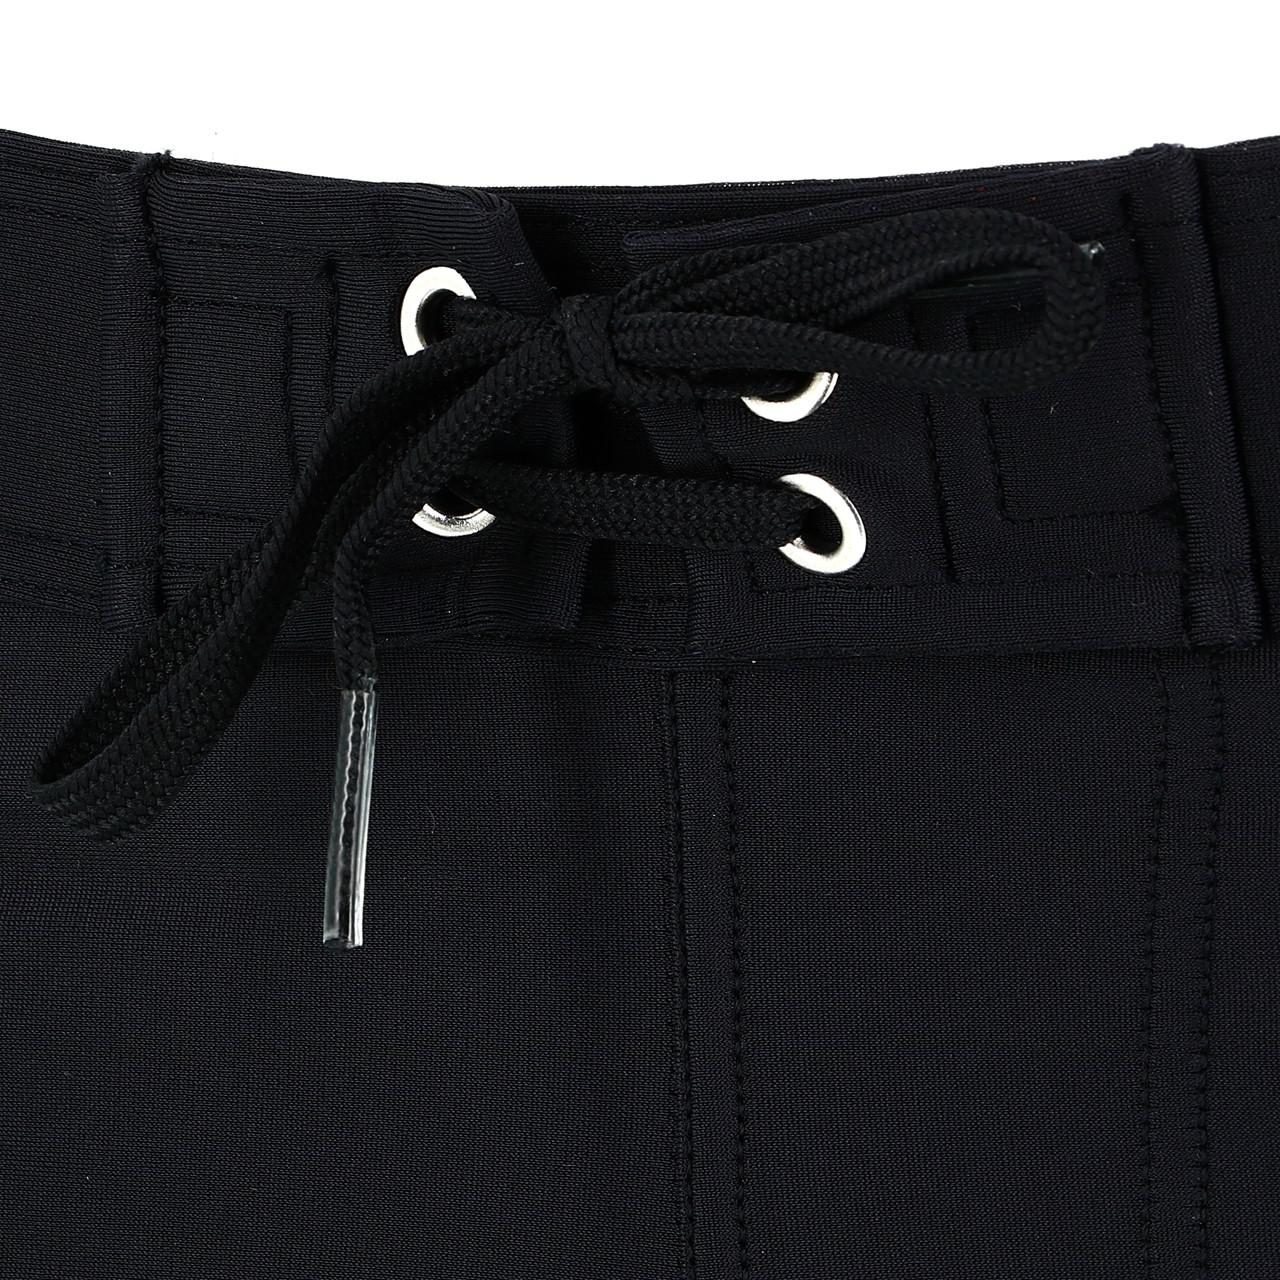 Boxer-Swimsuit-Arena-Java-mid-Jammer-Black-Black-70312-New thumbnail 3